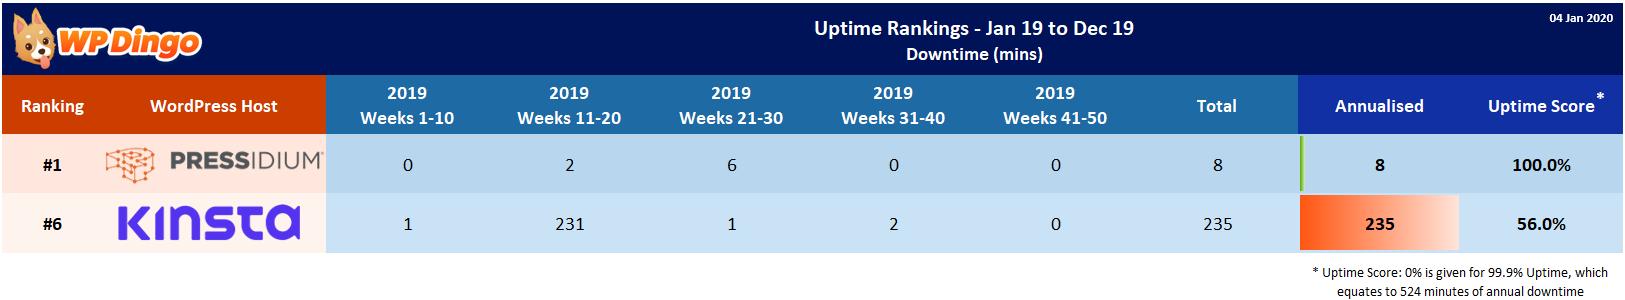 Kinsta vs Pressidium 2019 Uptime Test Results